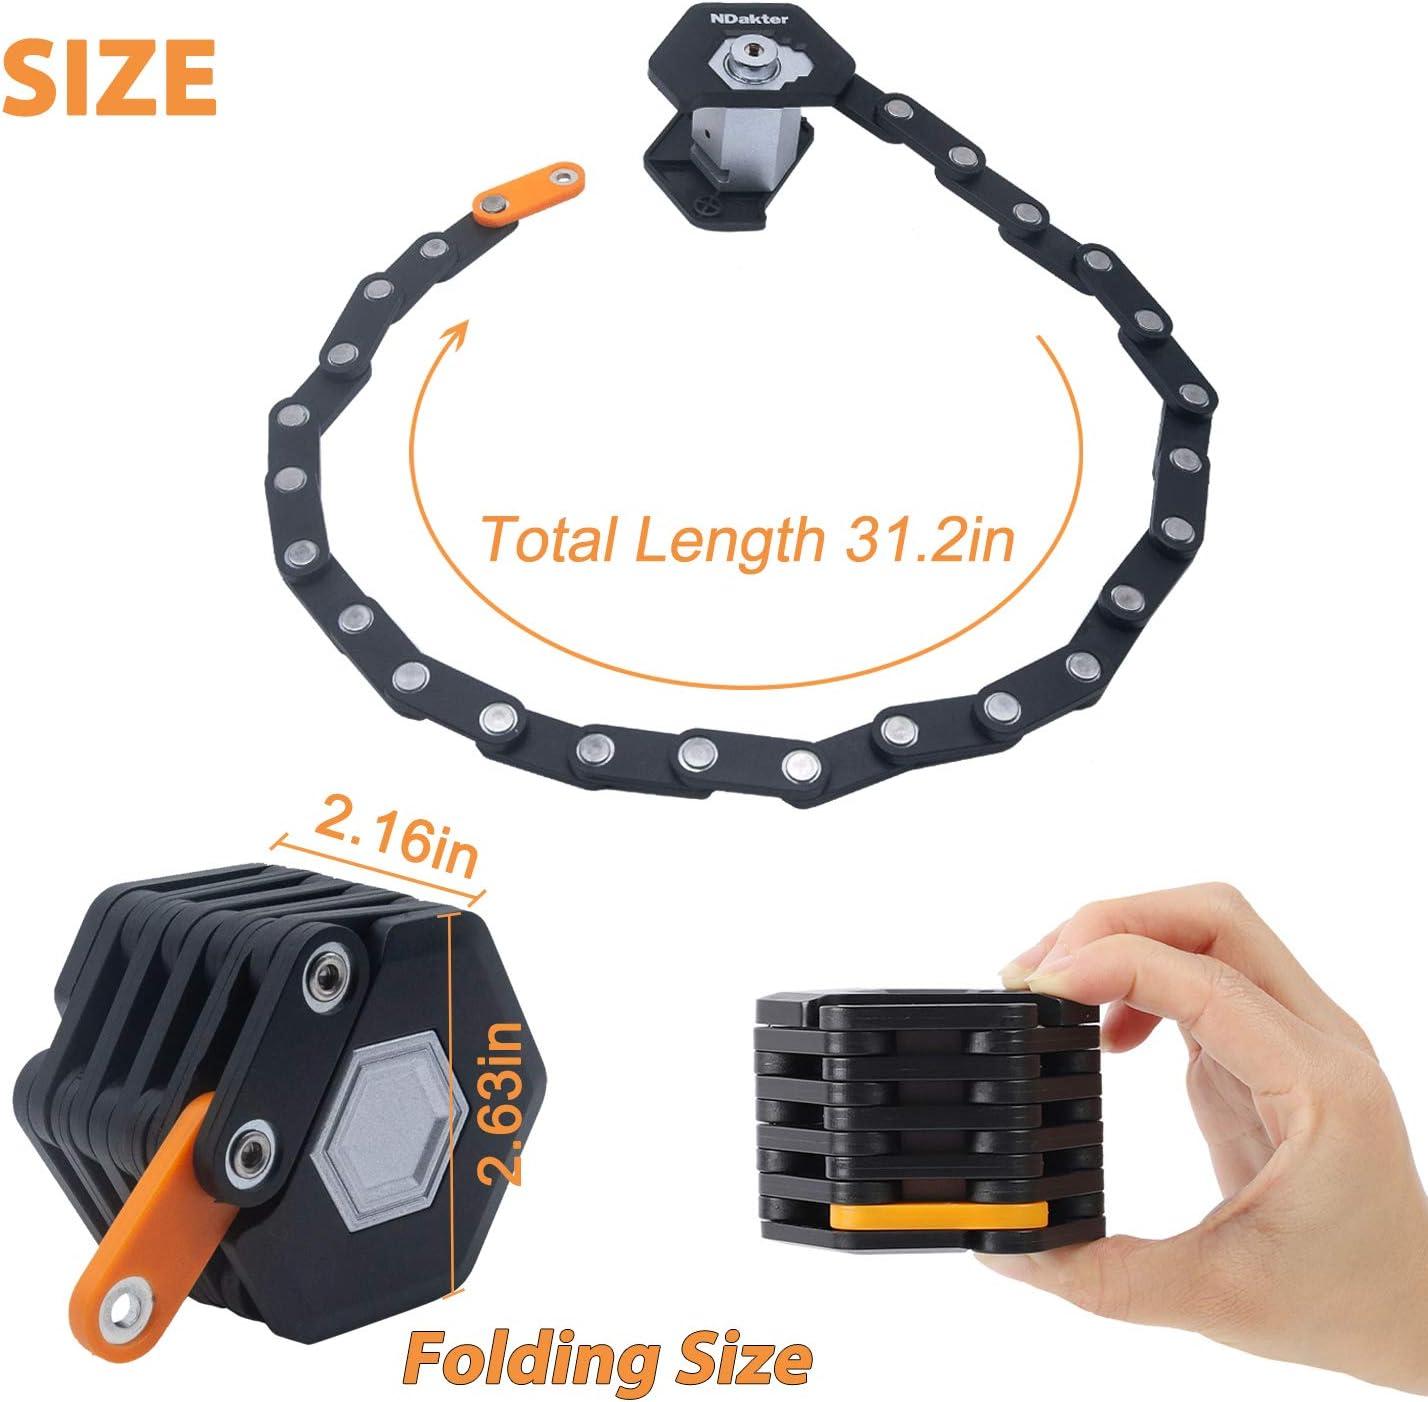 High Security Alloy Steel Locks Bike Burger Locks Heavy Duty Anti Theft NDakter Folding Bike Lock 3 Keys /& Mounting Bracket Included Bicycle Chain Lock 2.6FT//79CM